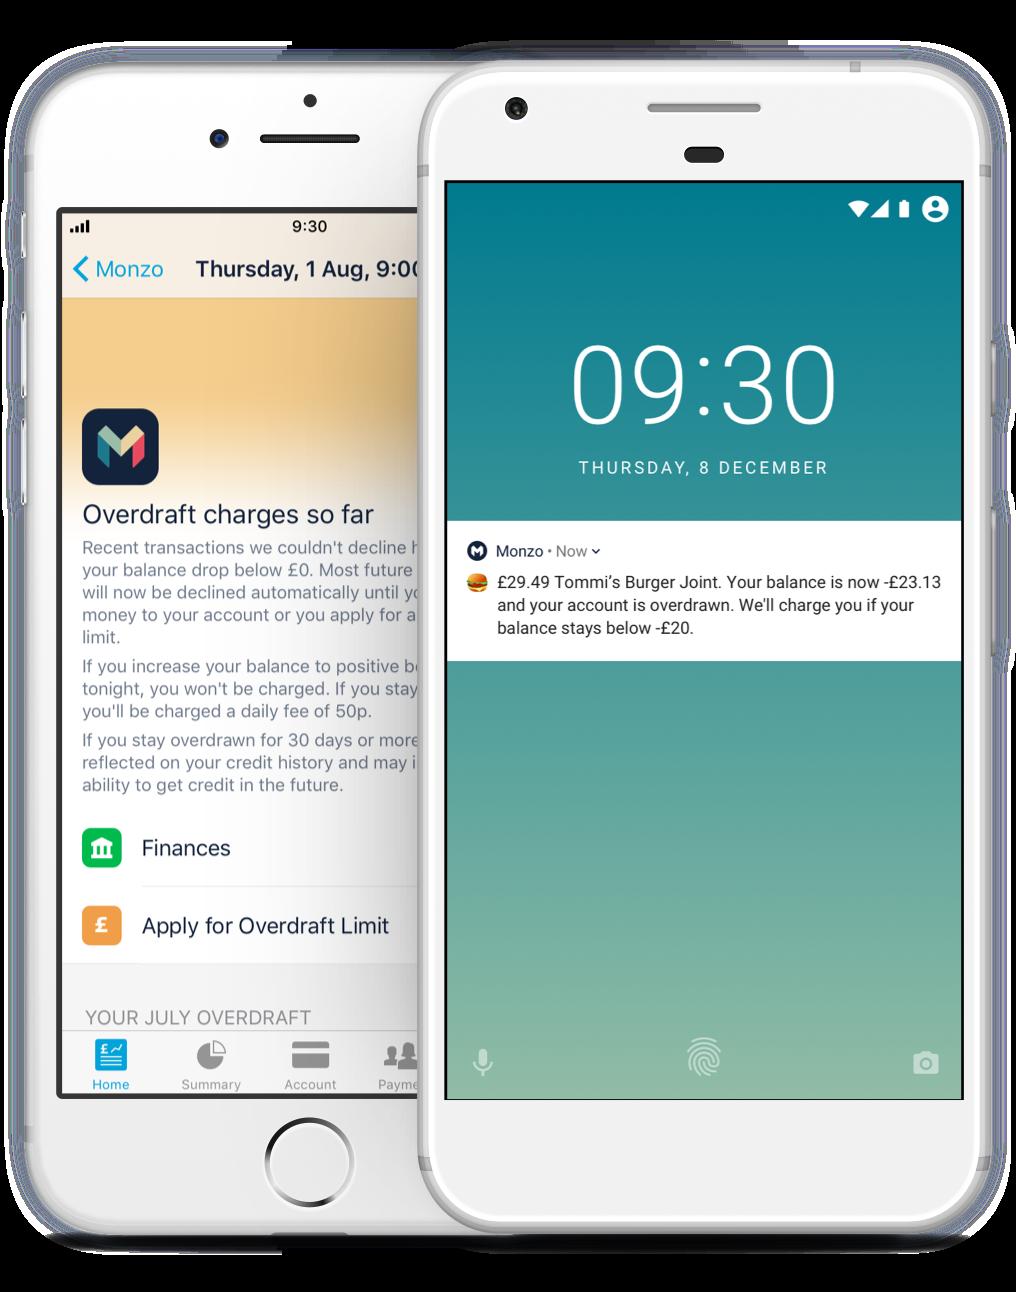 Phone notification show overdraft eligibility